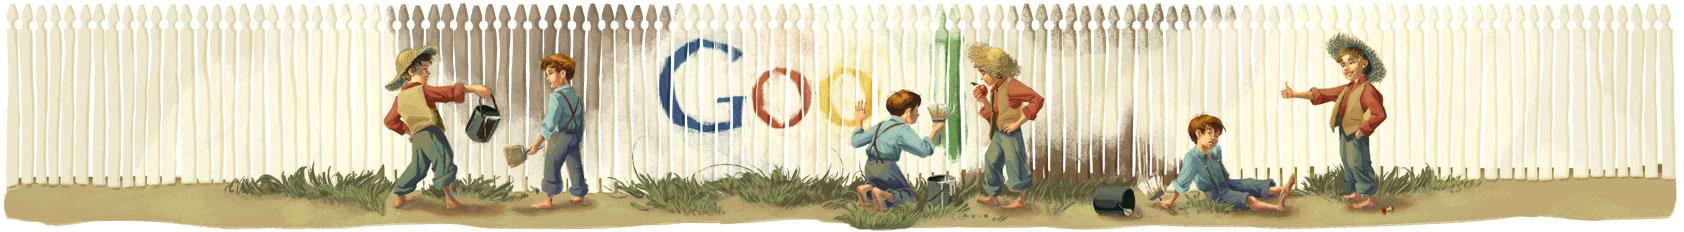 http://www.google.com.hk//logos/2011/twain11-hp-bg.jpg